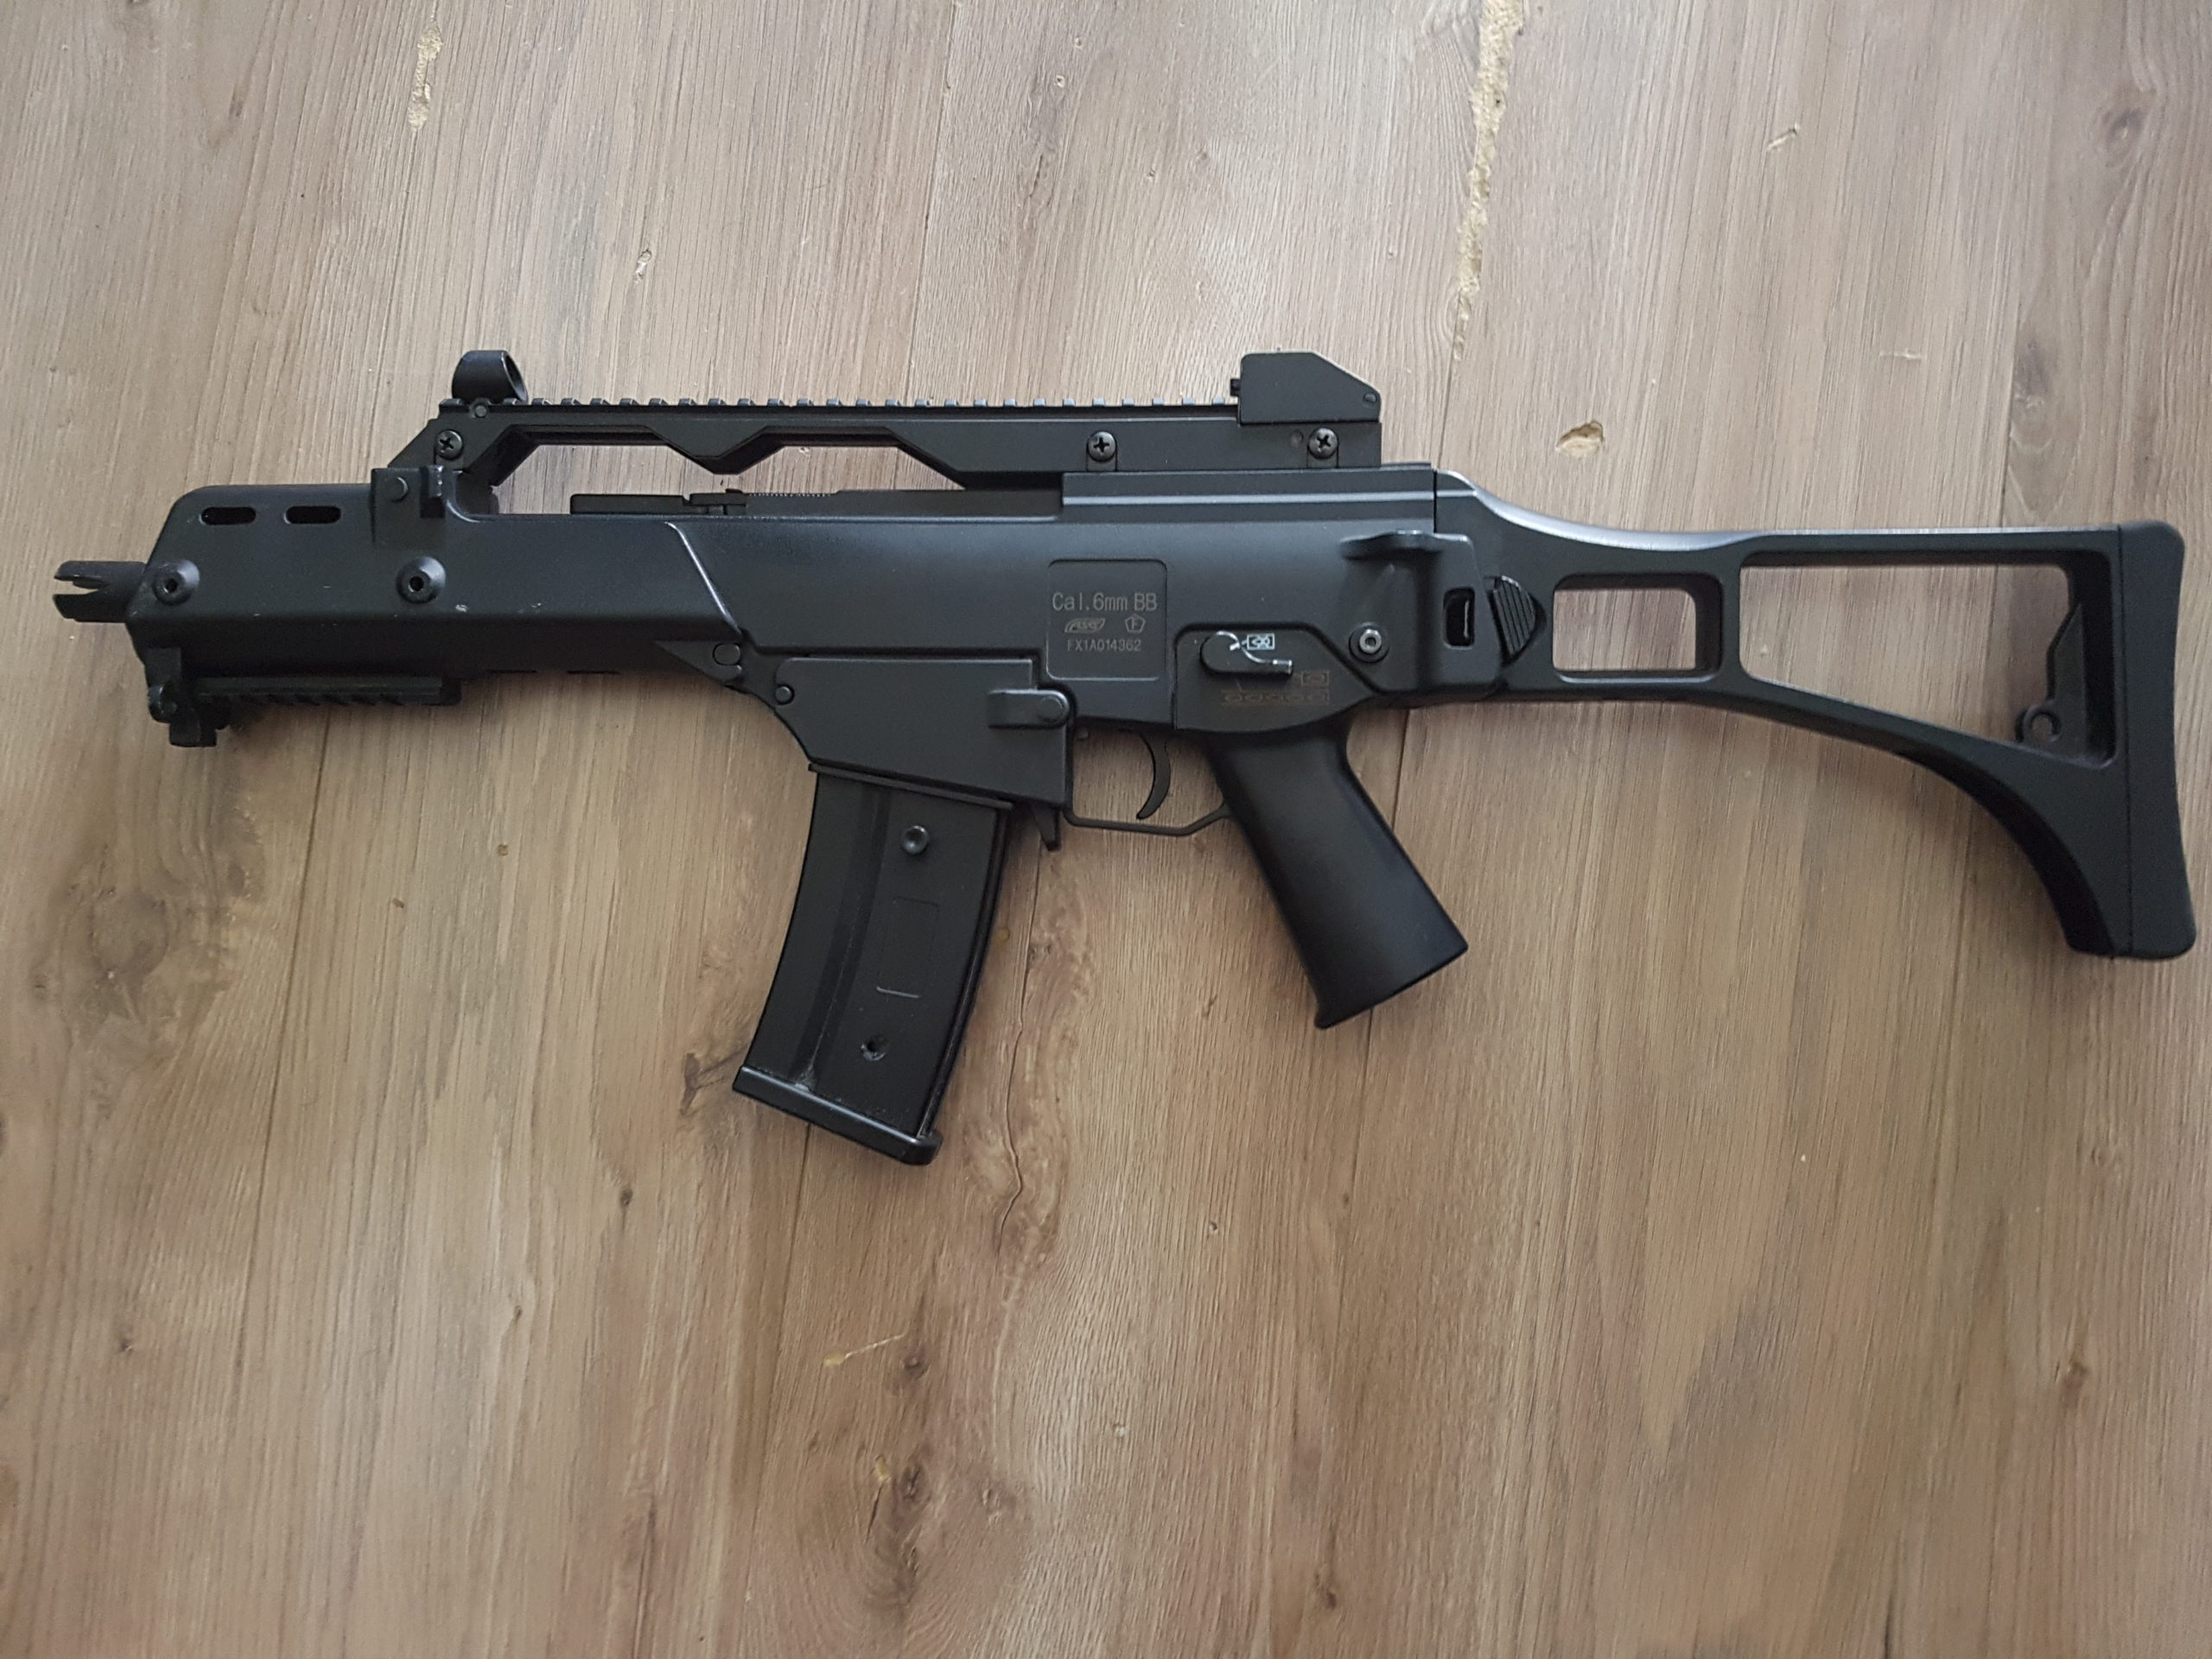 SLV36 ASG (G36C)